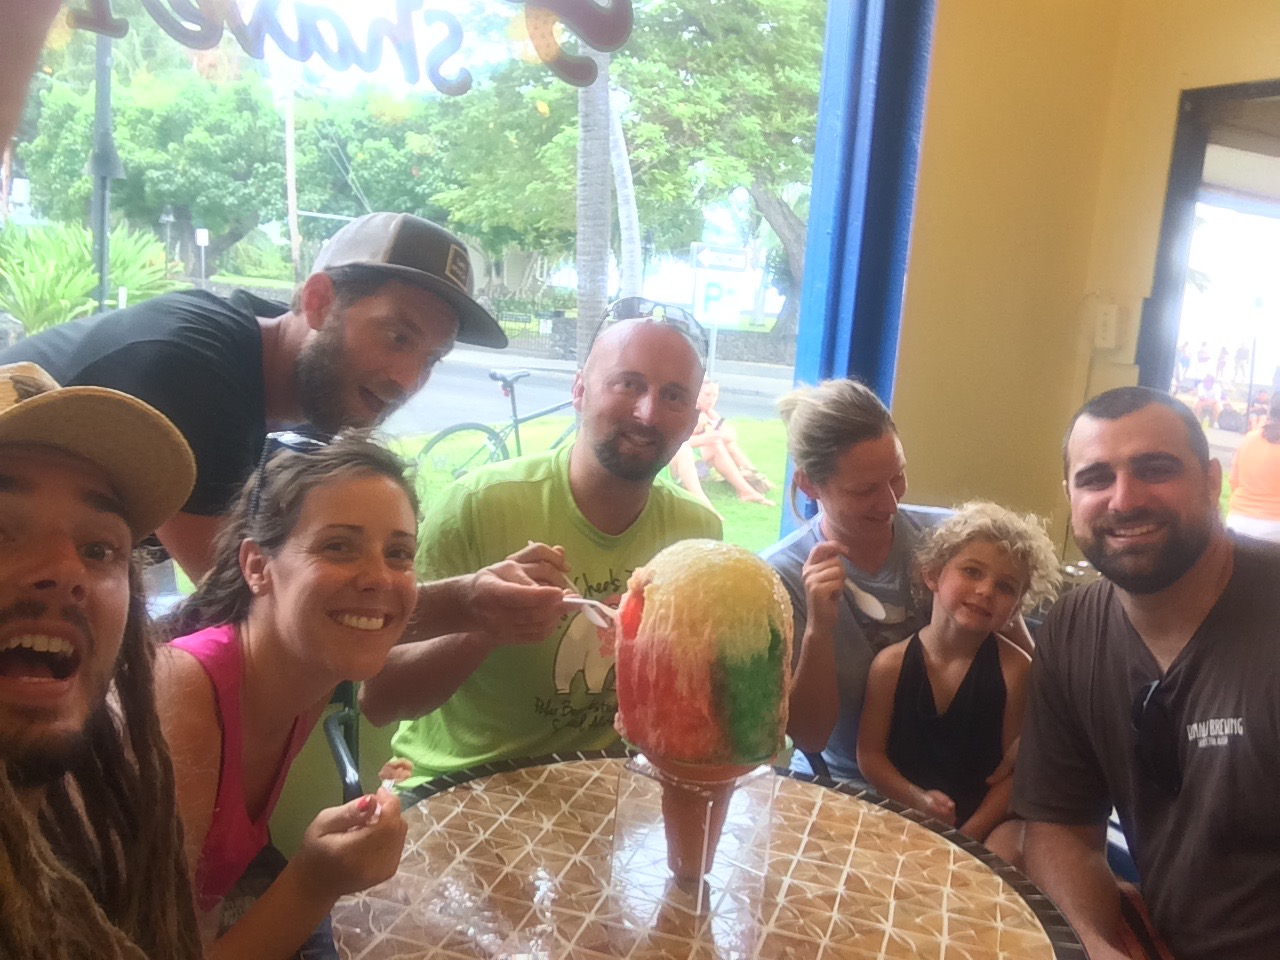 Seven Alaskans enjoying a winter in Hawai'i and sharing a Hawaiian delicacy...Shave Ice!